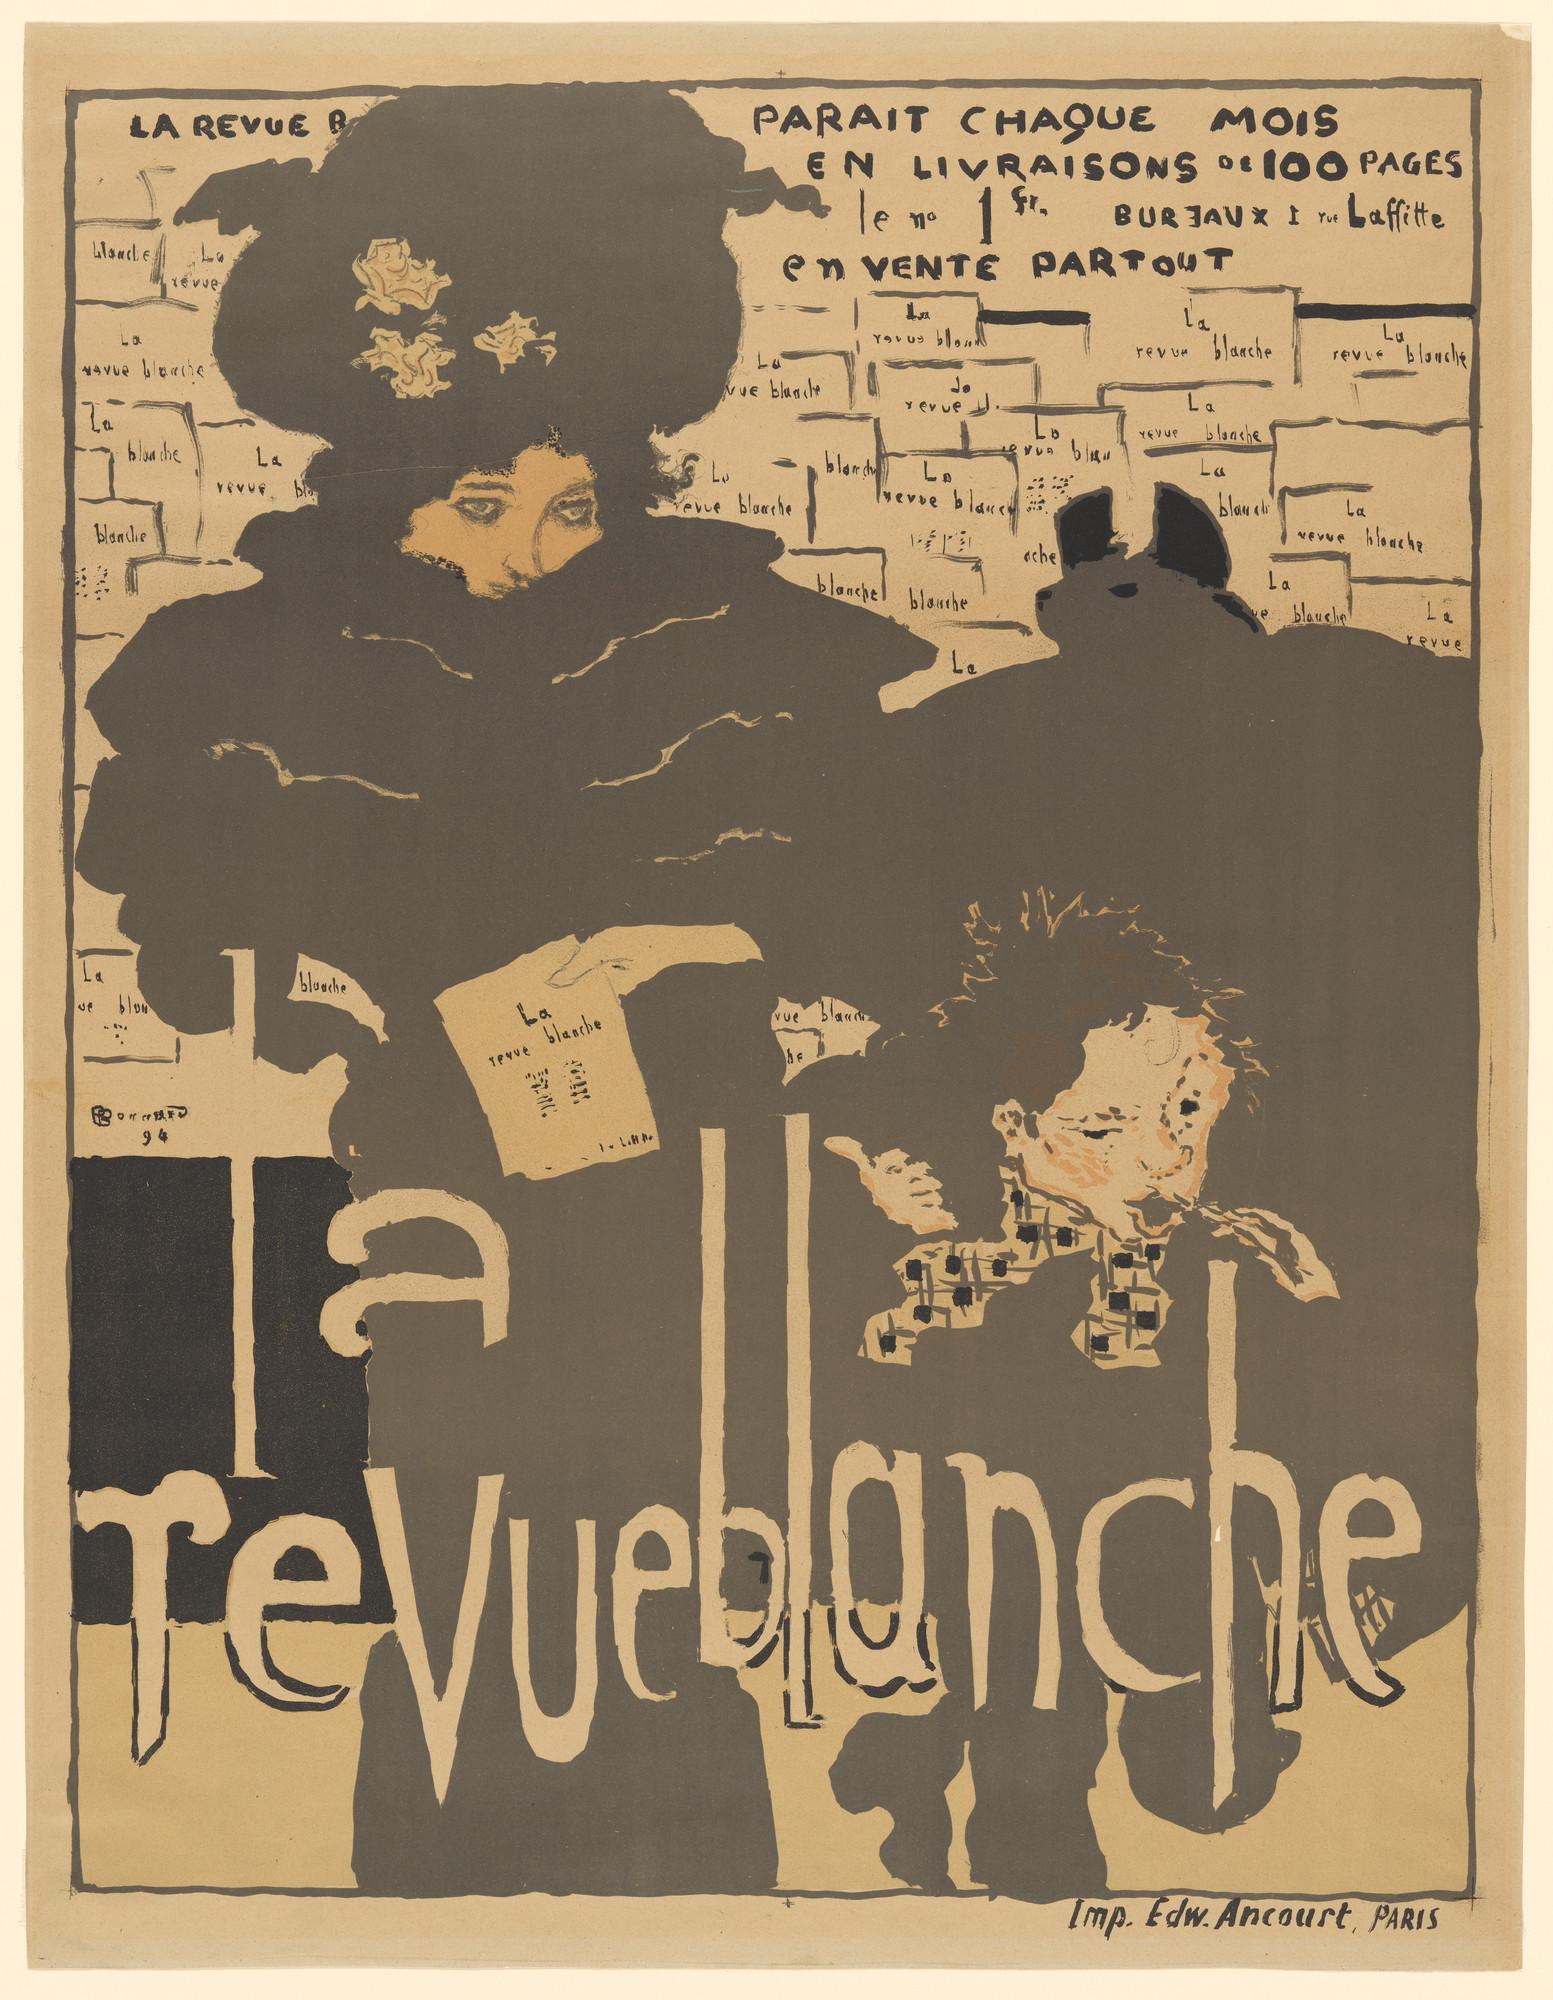 Pierre Bonnard, La Revue Blanche, 1894, lithograph, 80.7 x 61.9 cm (MoMA)